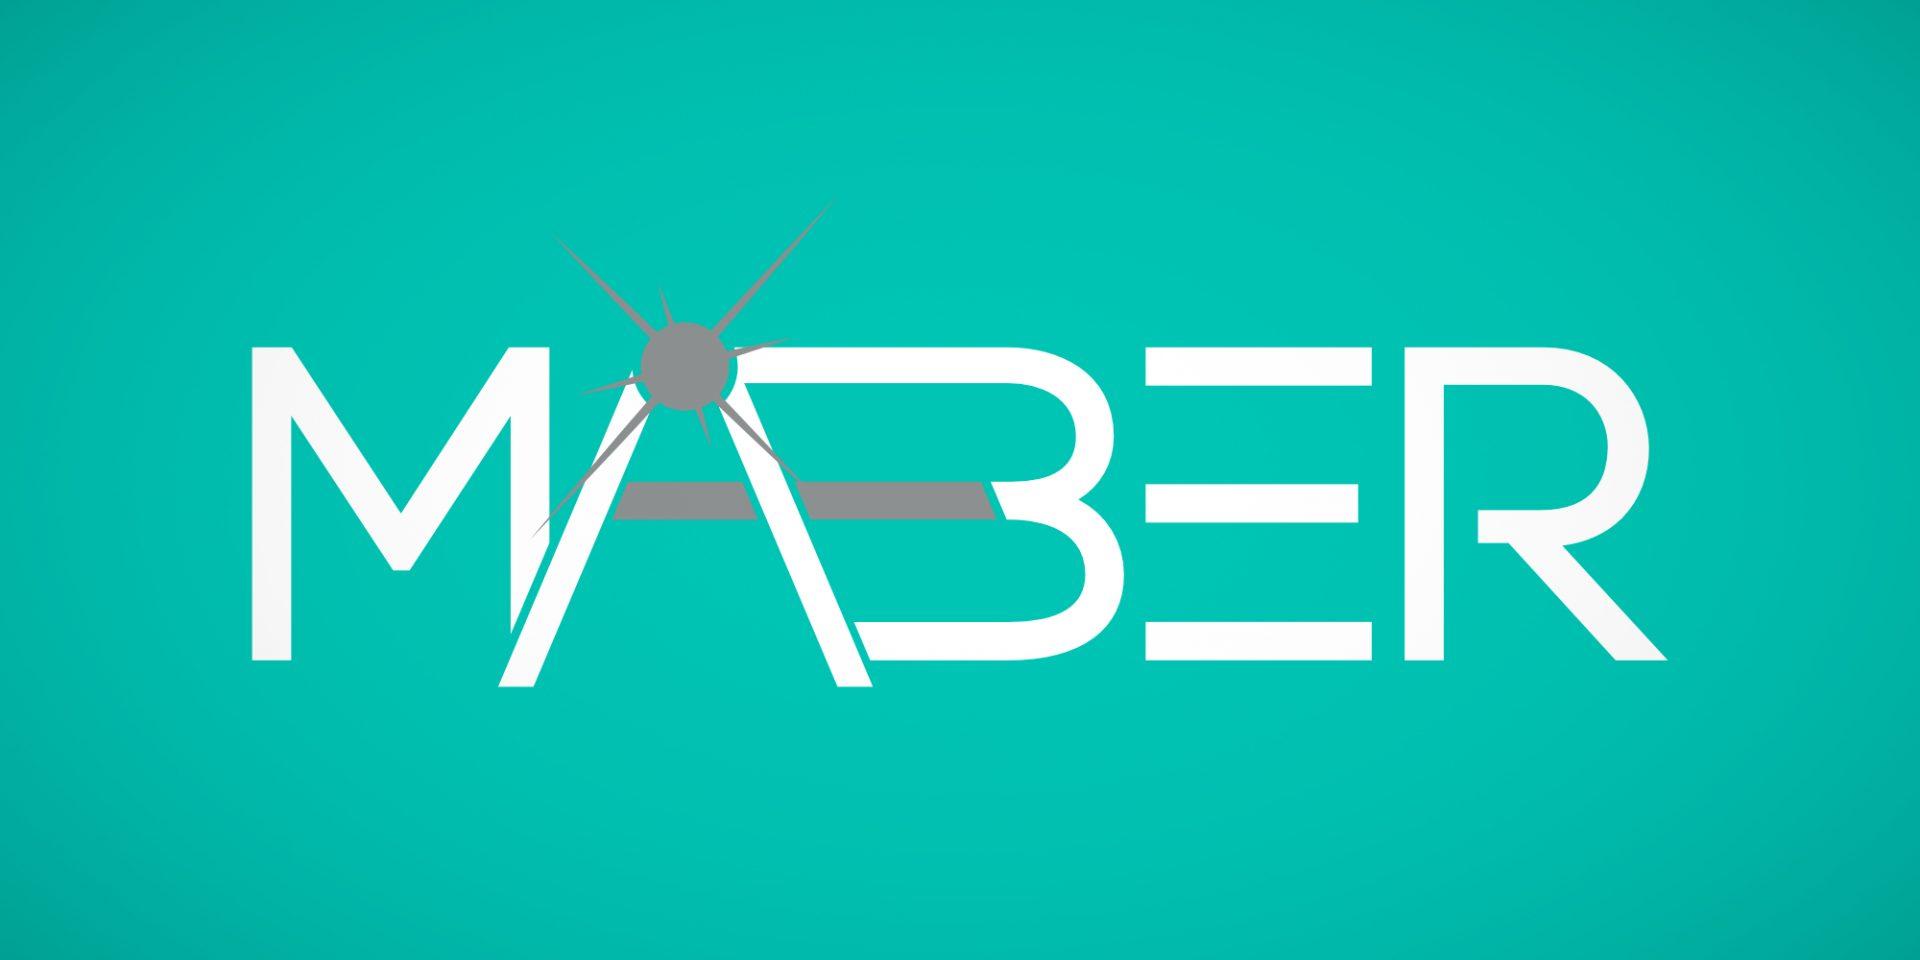 Maber